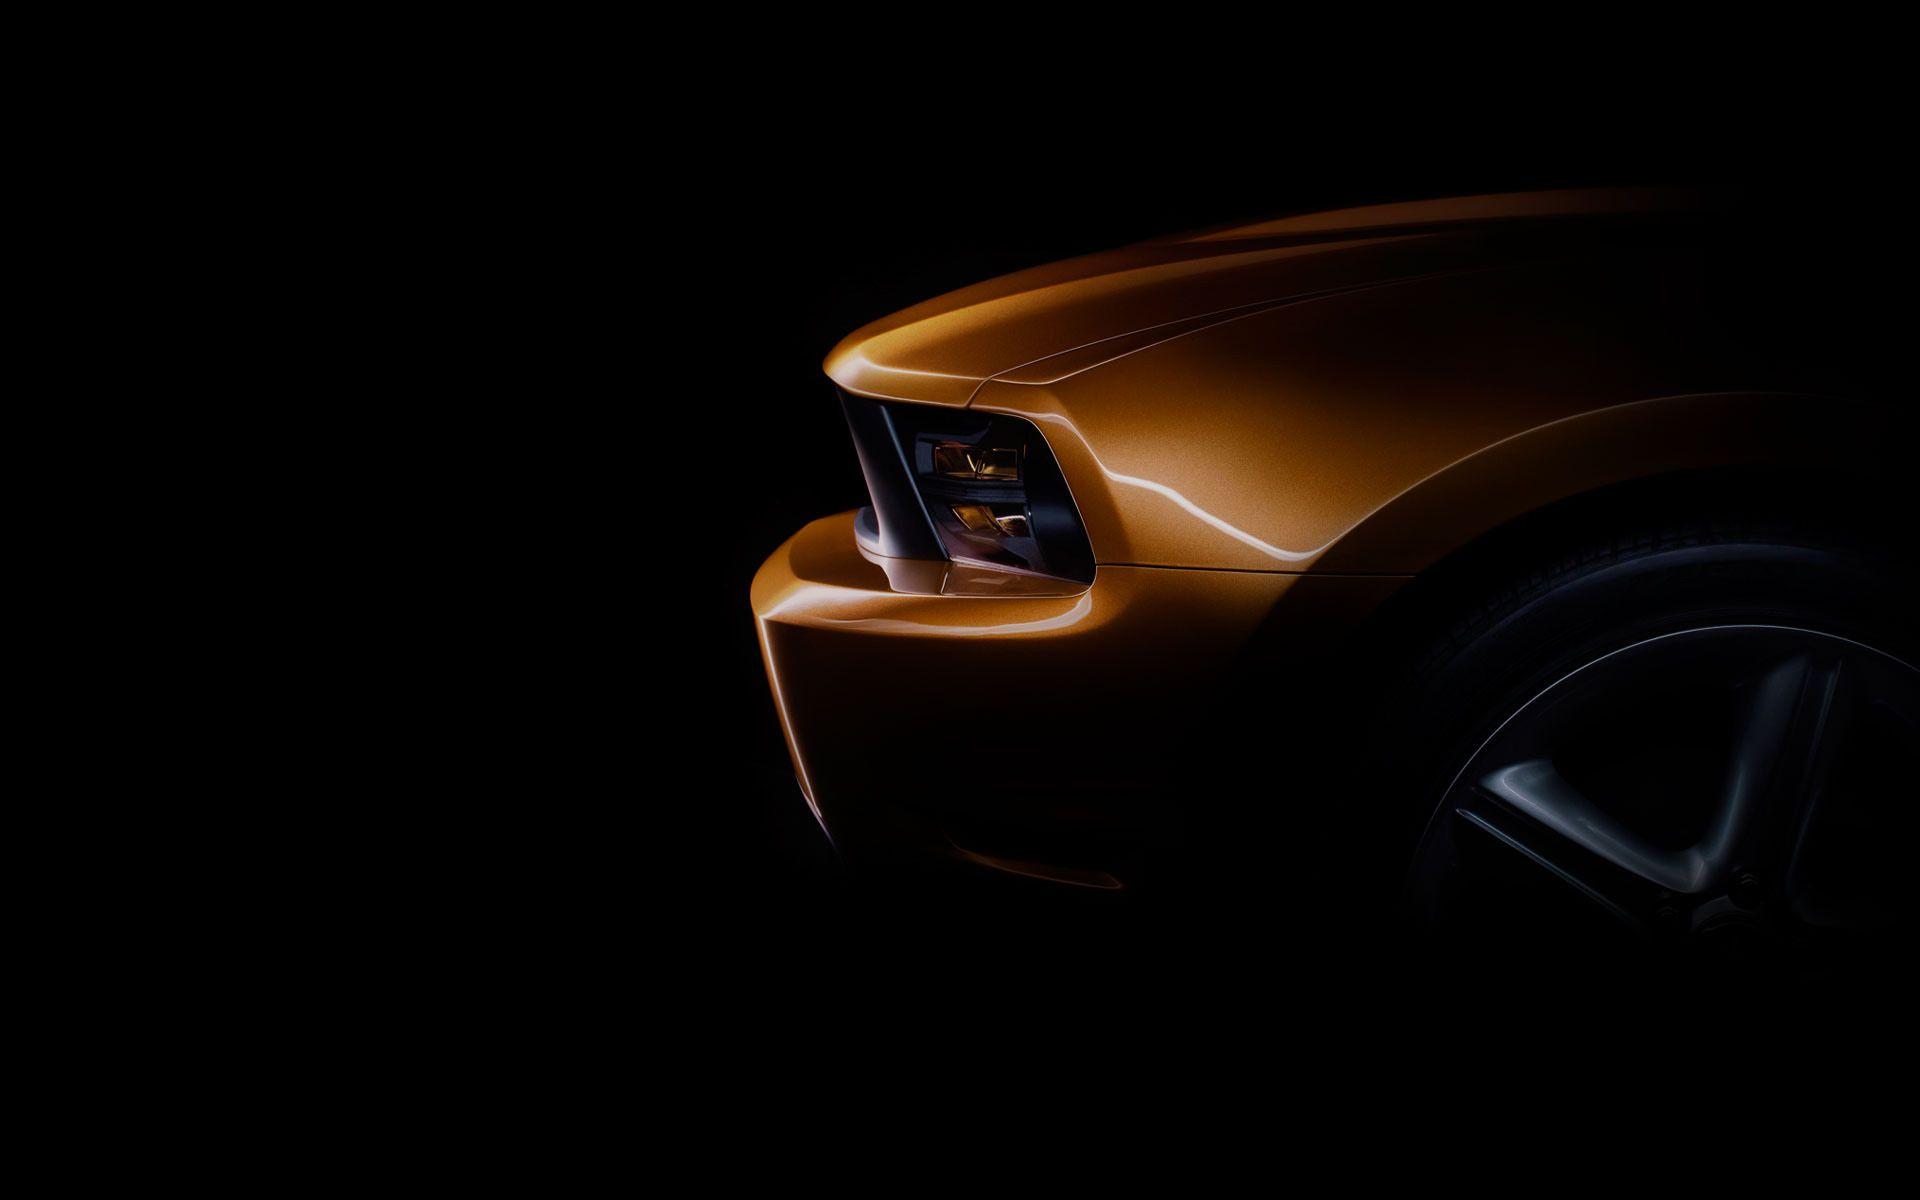 Best Wallpaper Logo Ford Mustang - 9973c14845d2840bec91dd8f0410db3a  Trends_183168.jpg